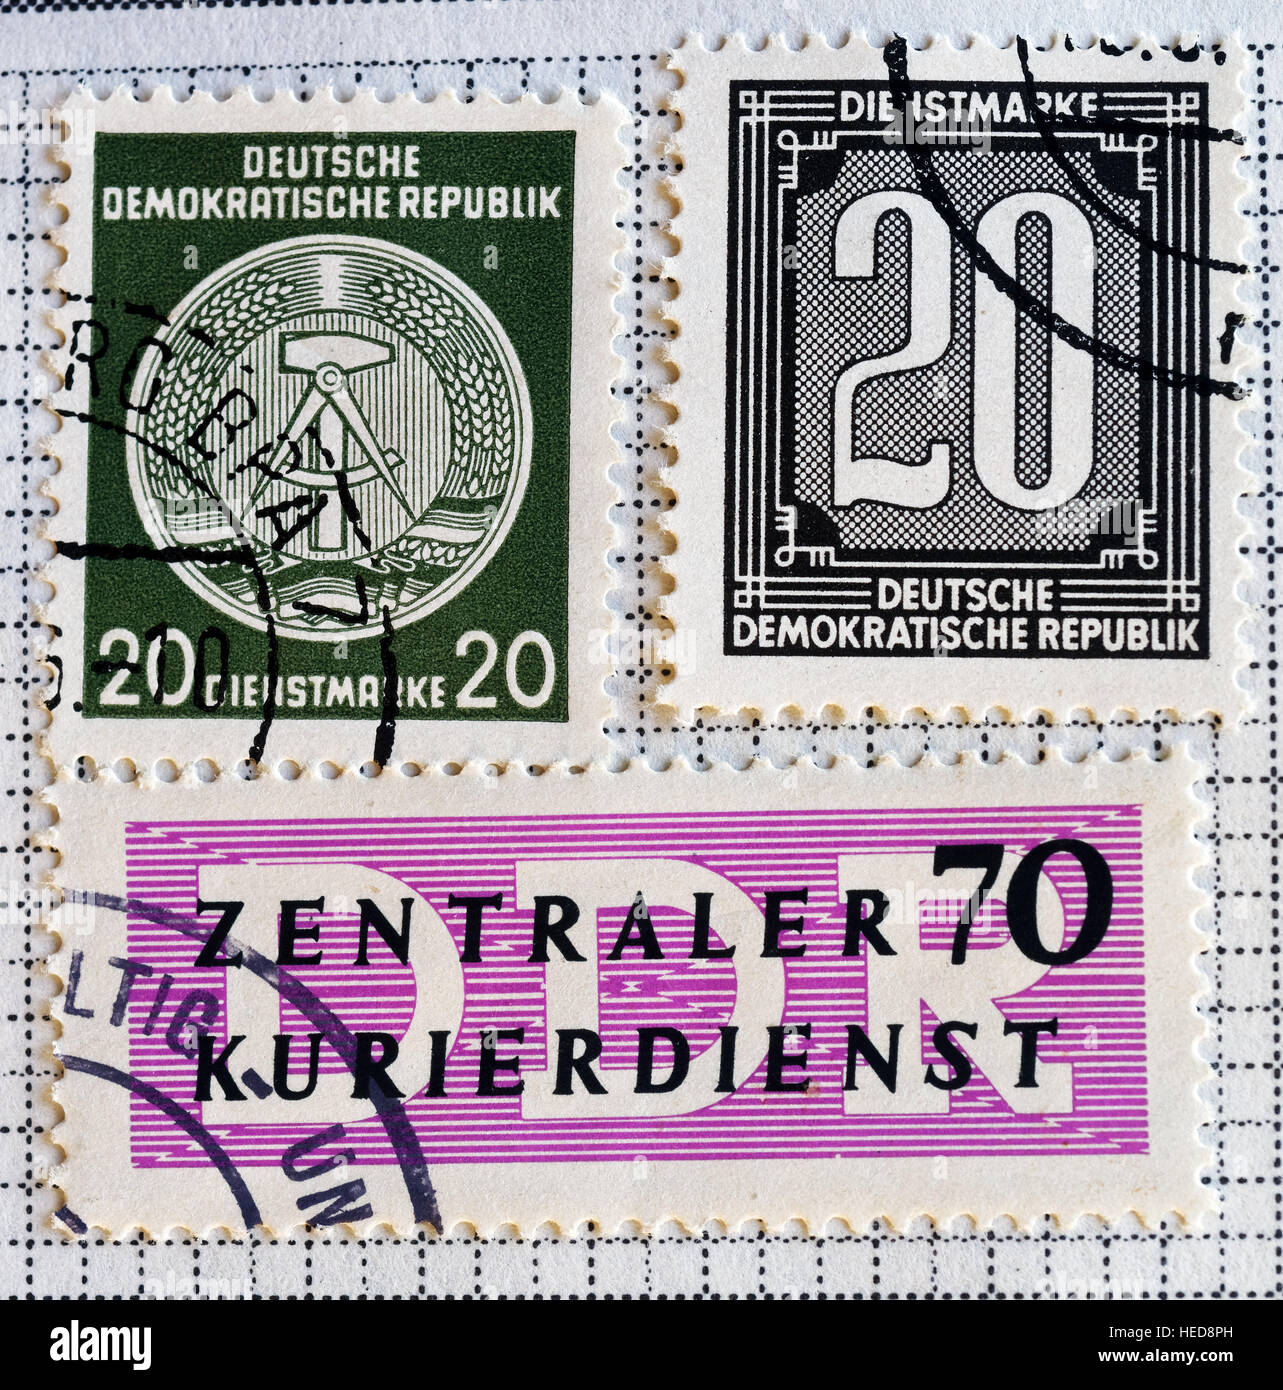 East German (DDR) postage stamps - Stock Image